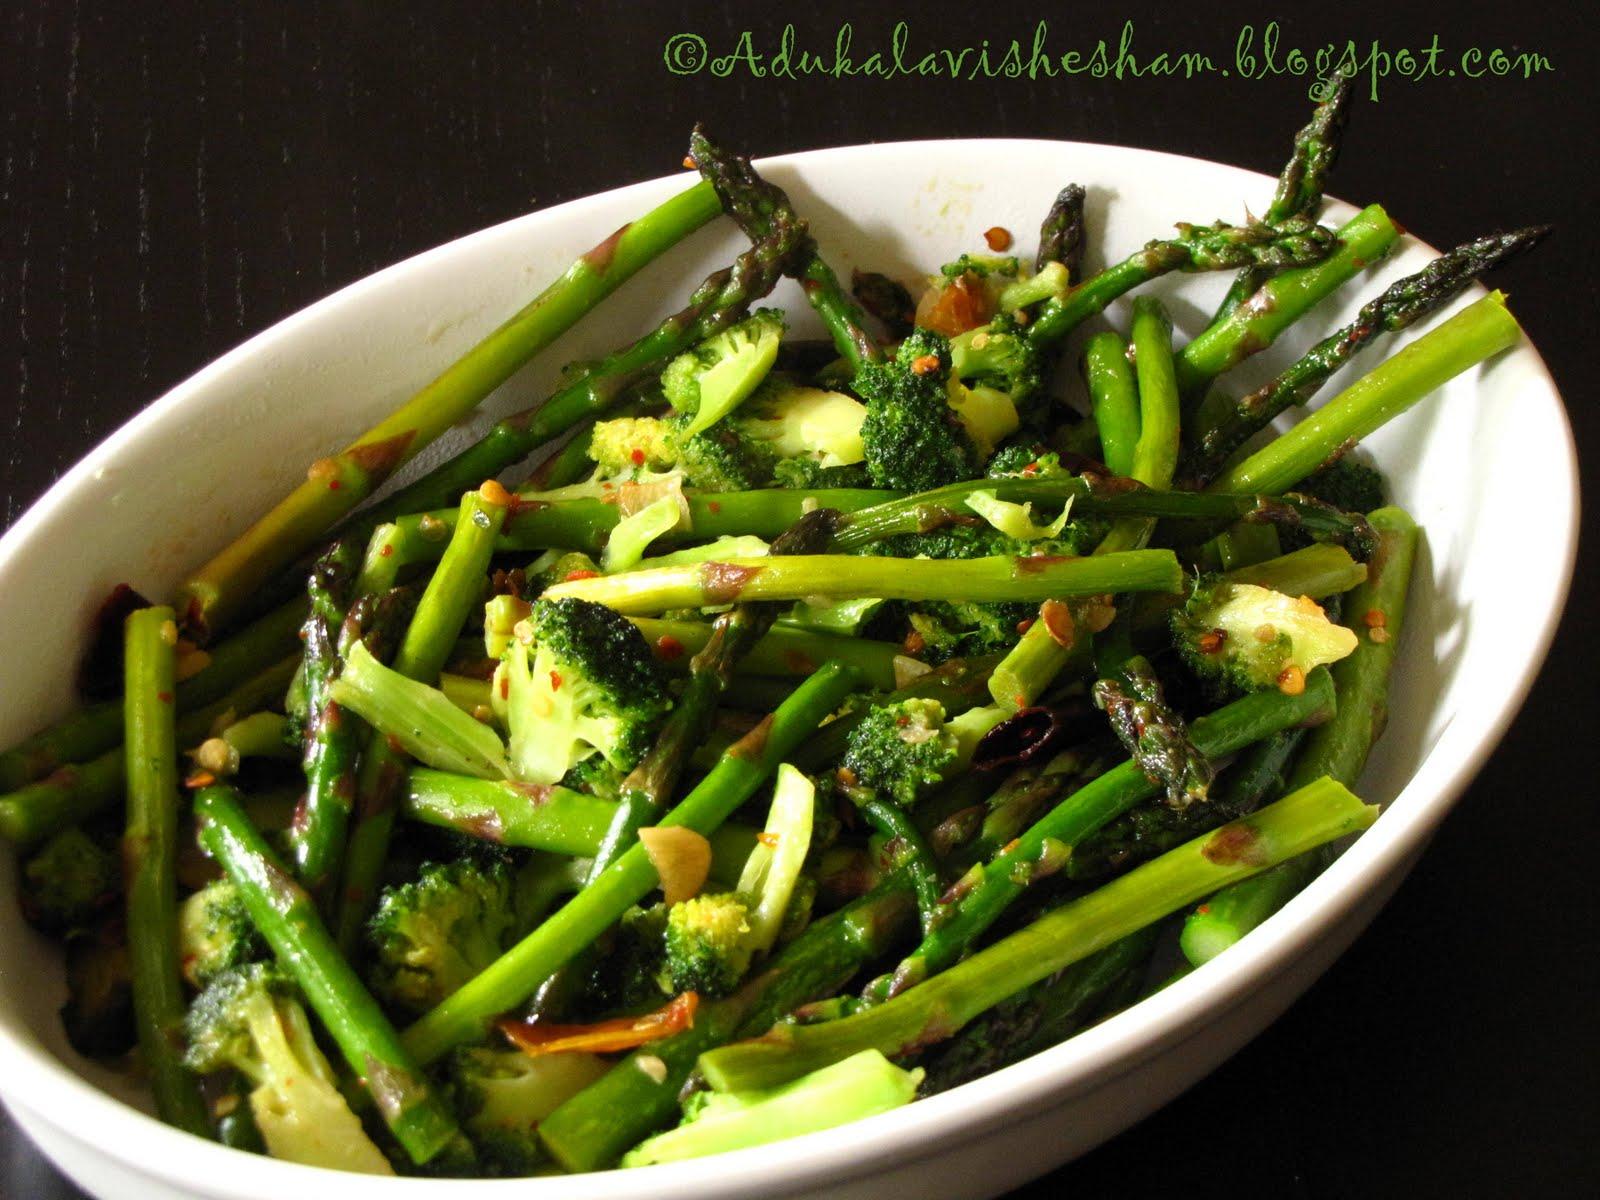 Adukala Vishesham: Broccoli Asparagus Stir Fry